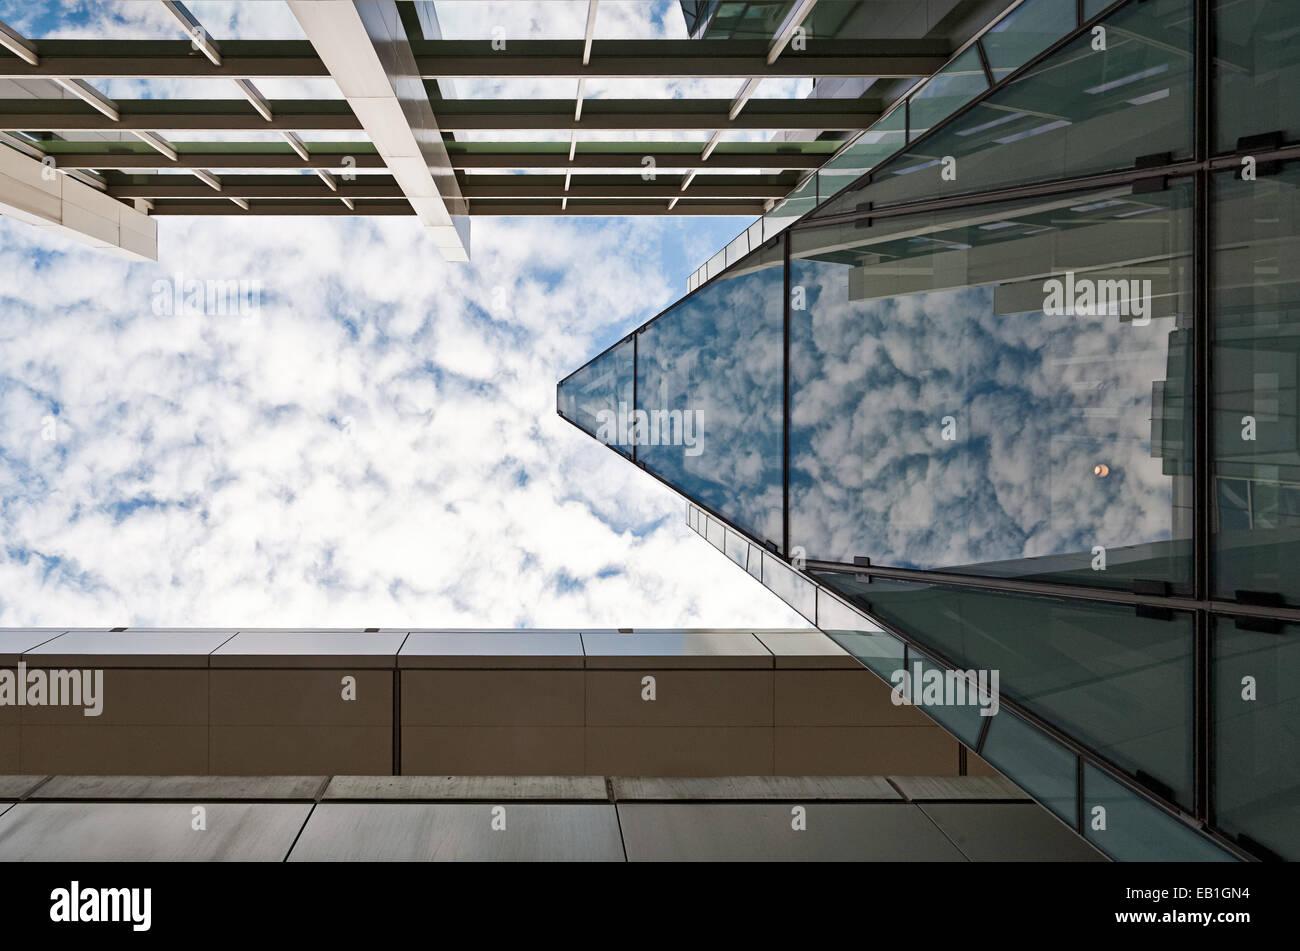 Architektonisches Detail am Flughafen Boston. Stockbild